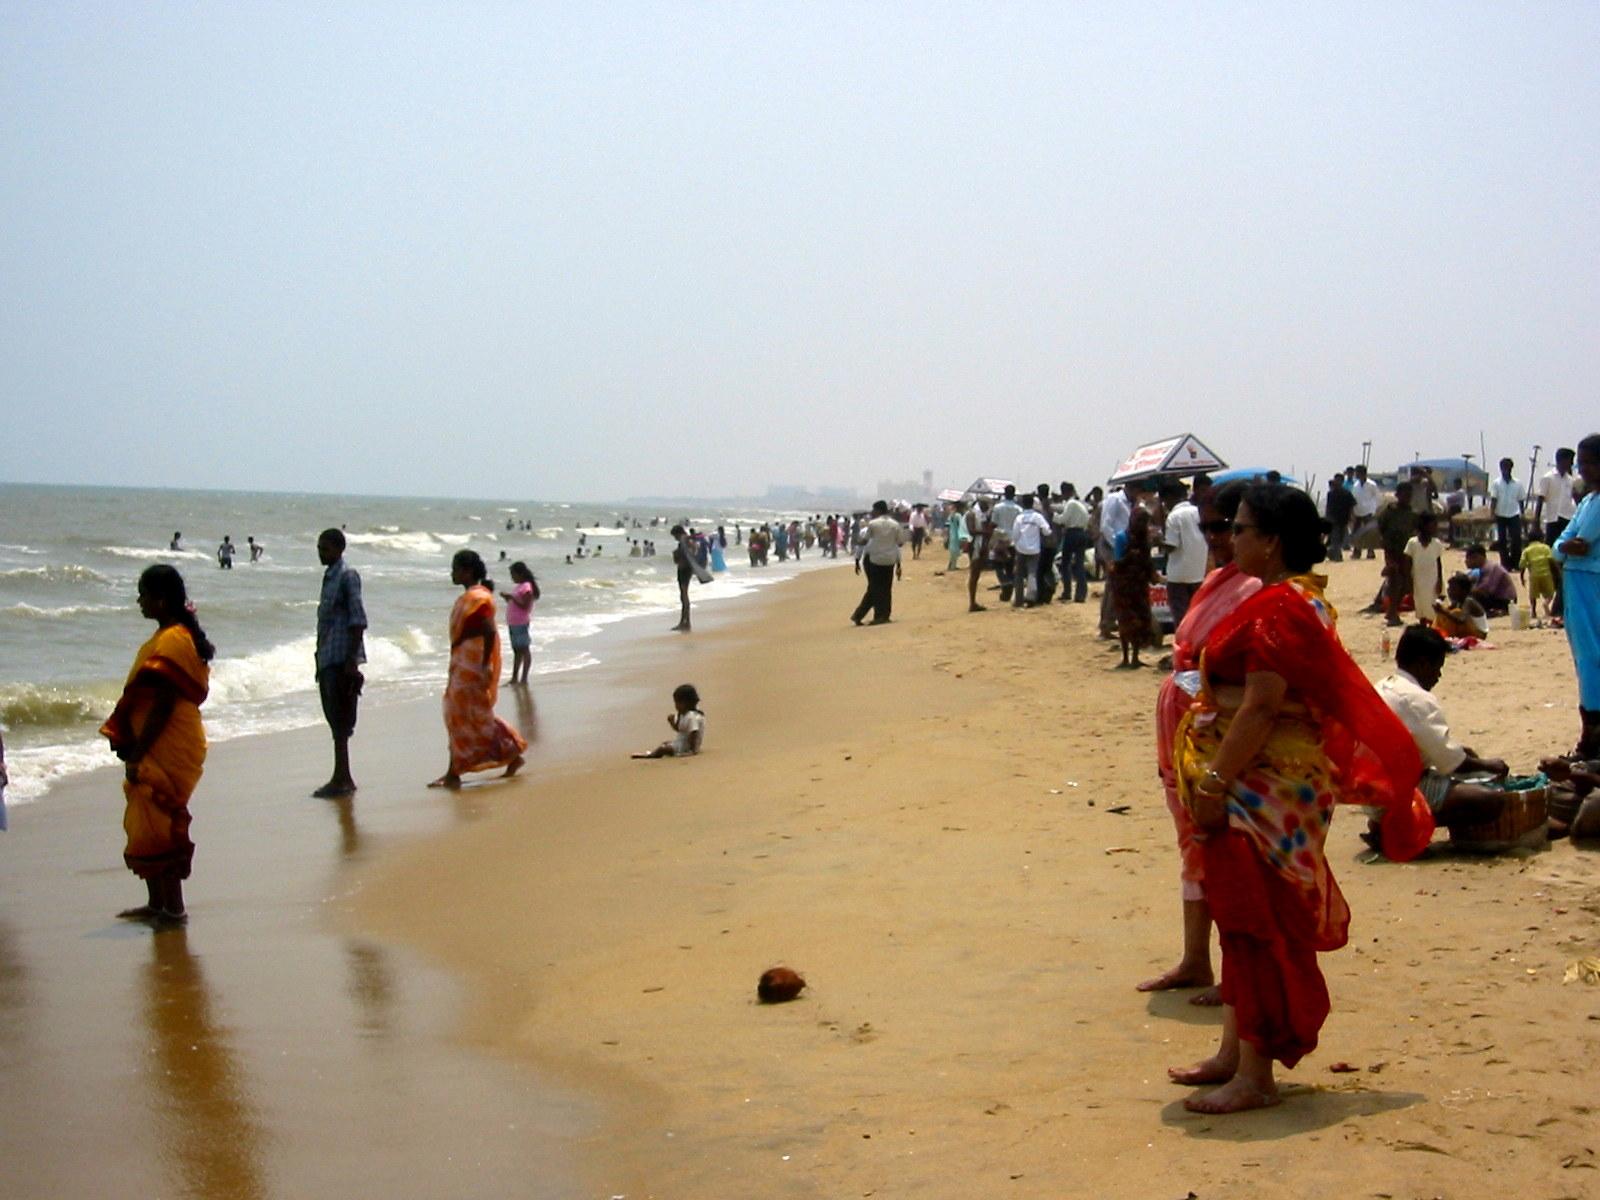 Www Jumara Beach Photos Com, Check Out Www Jumara Beach ...